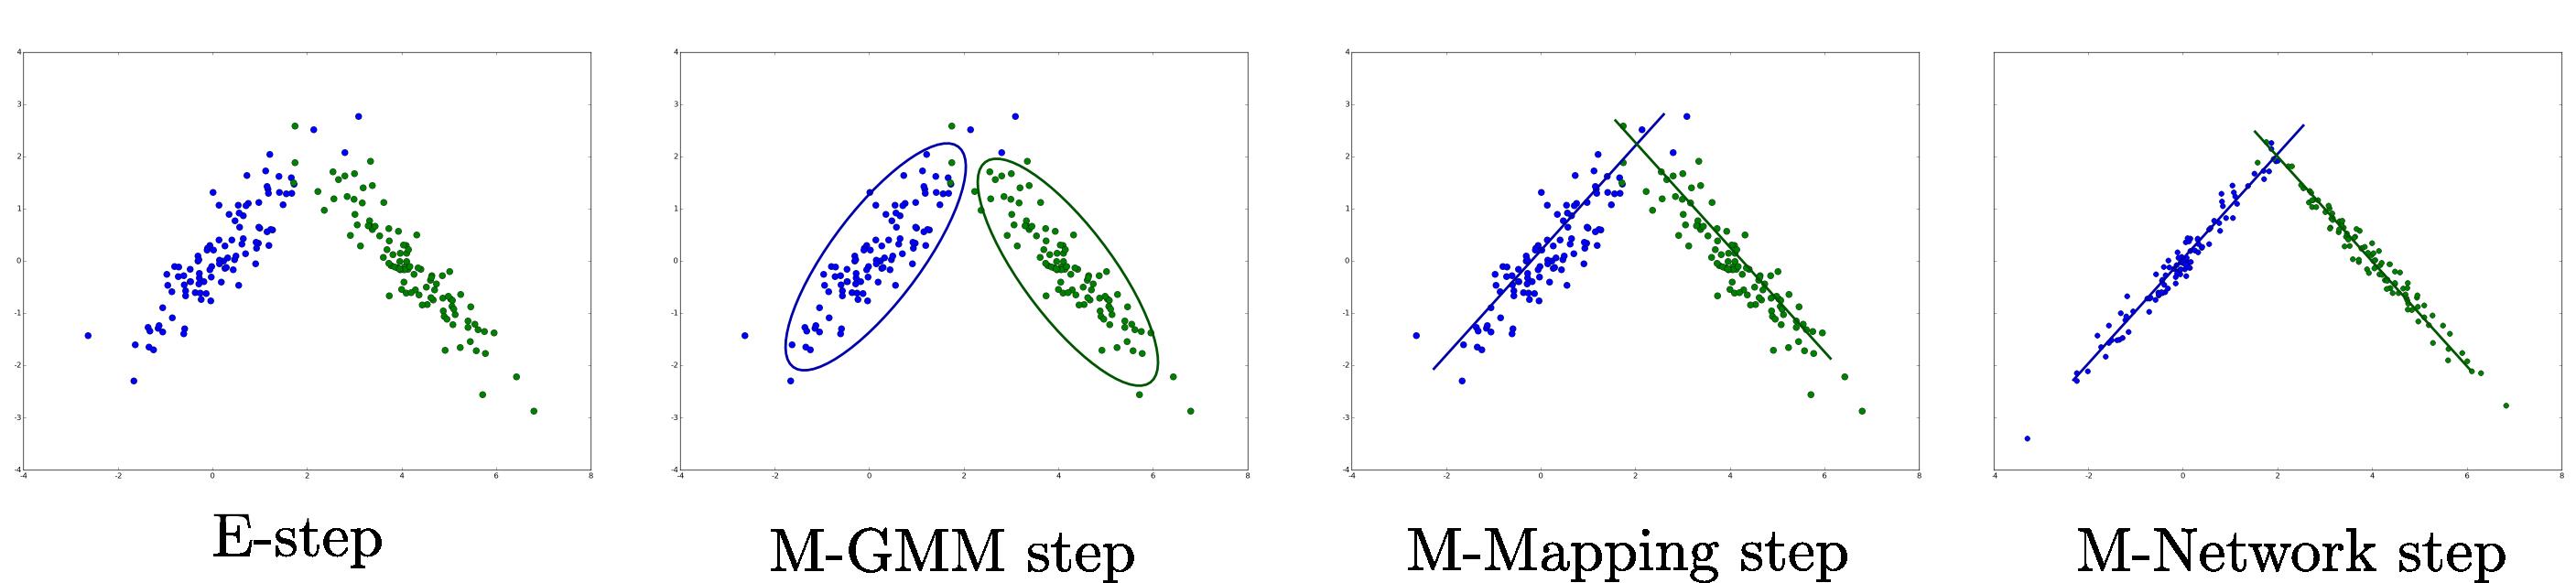 Deep Mixture of Linear Inverse Regressions  